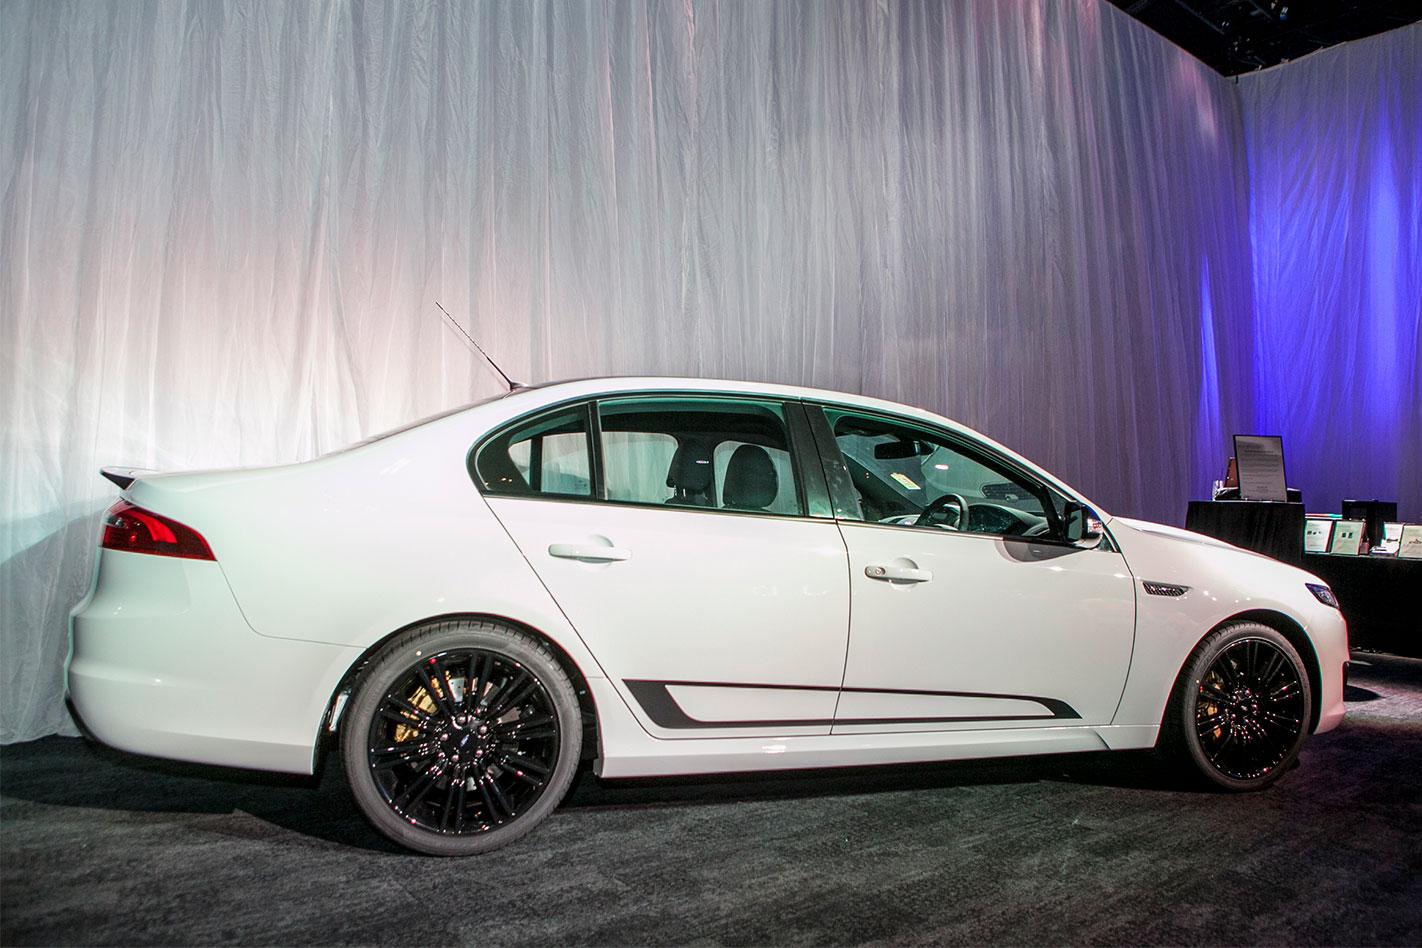 Ford -Falcon -XR8-Sprint -charity -rear